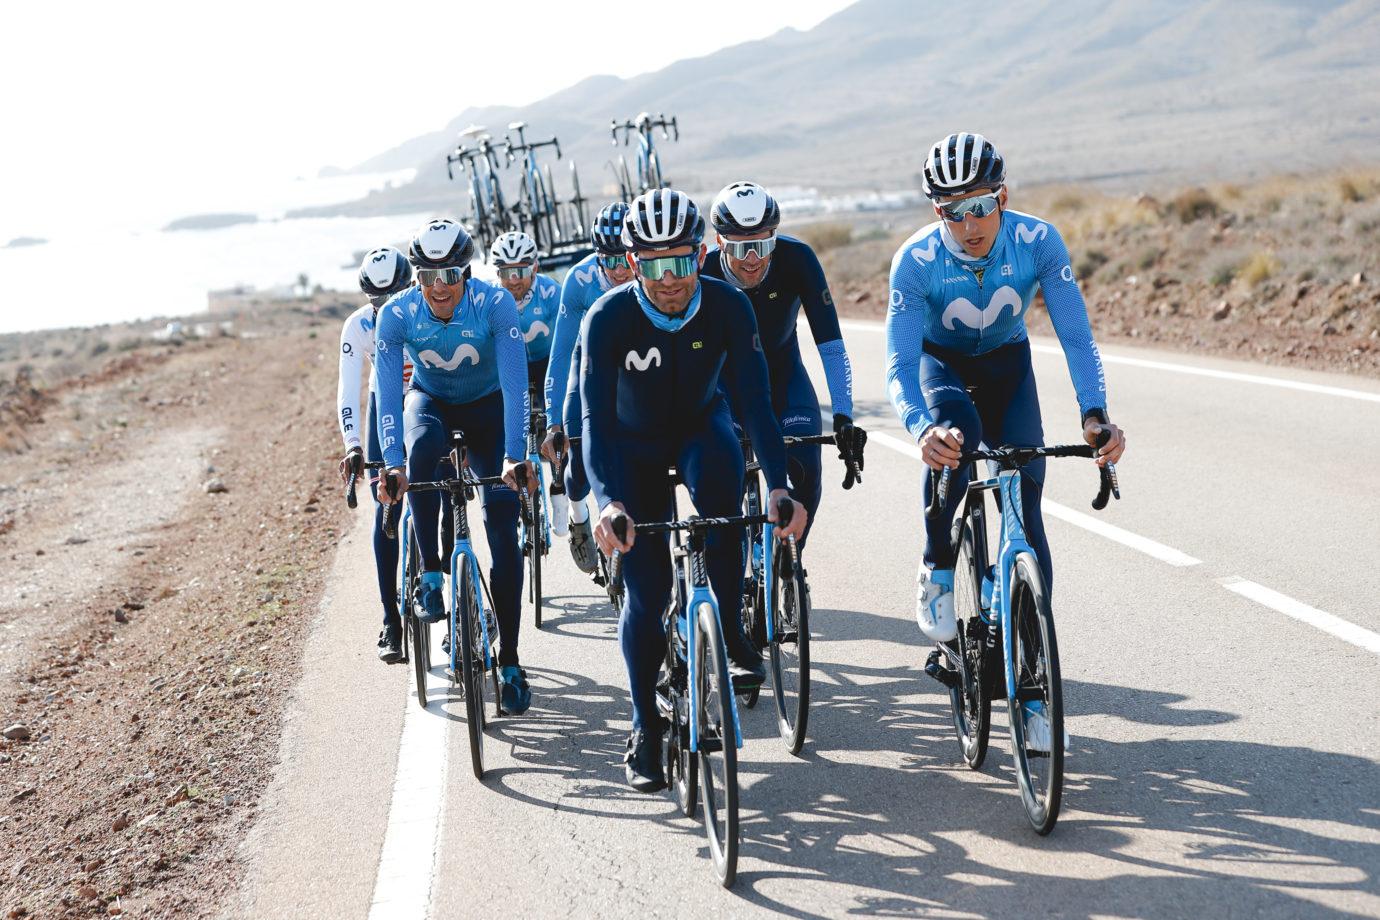 Imagen de la noticia 'Movistar Team enjoying the early days of its Almería training camp'